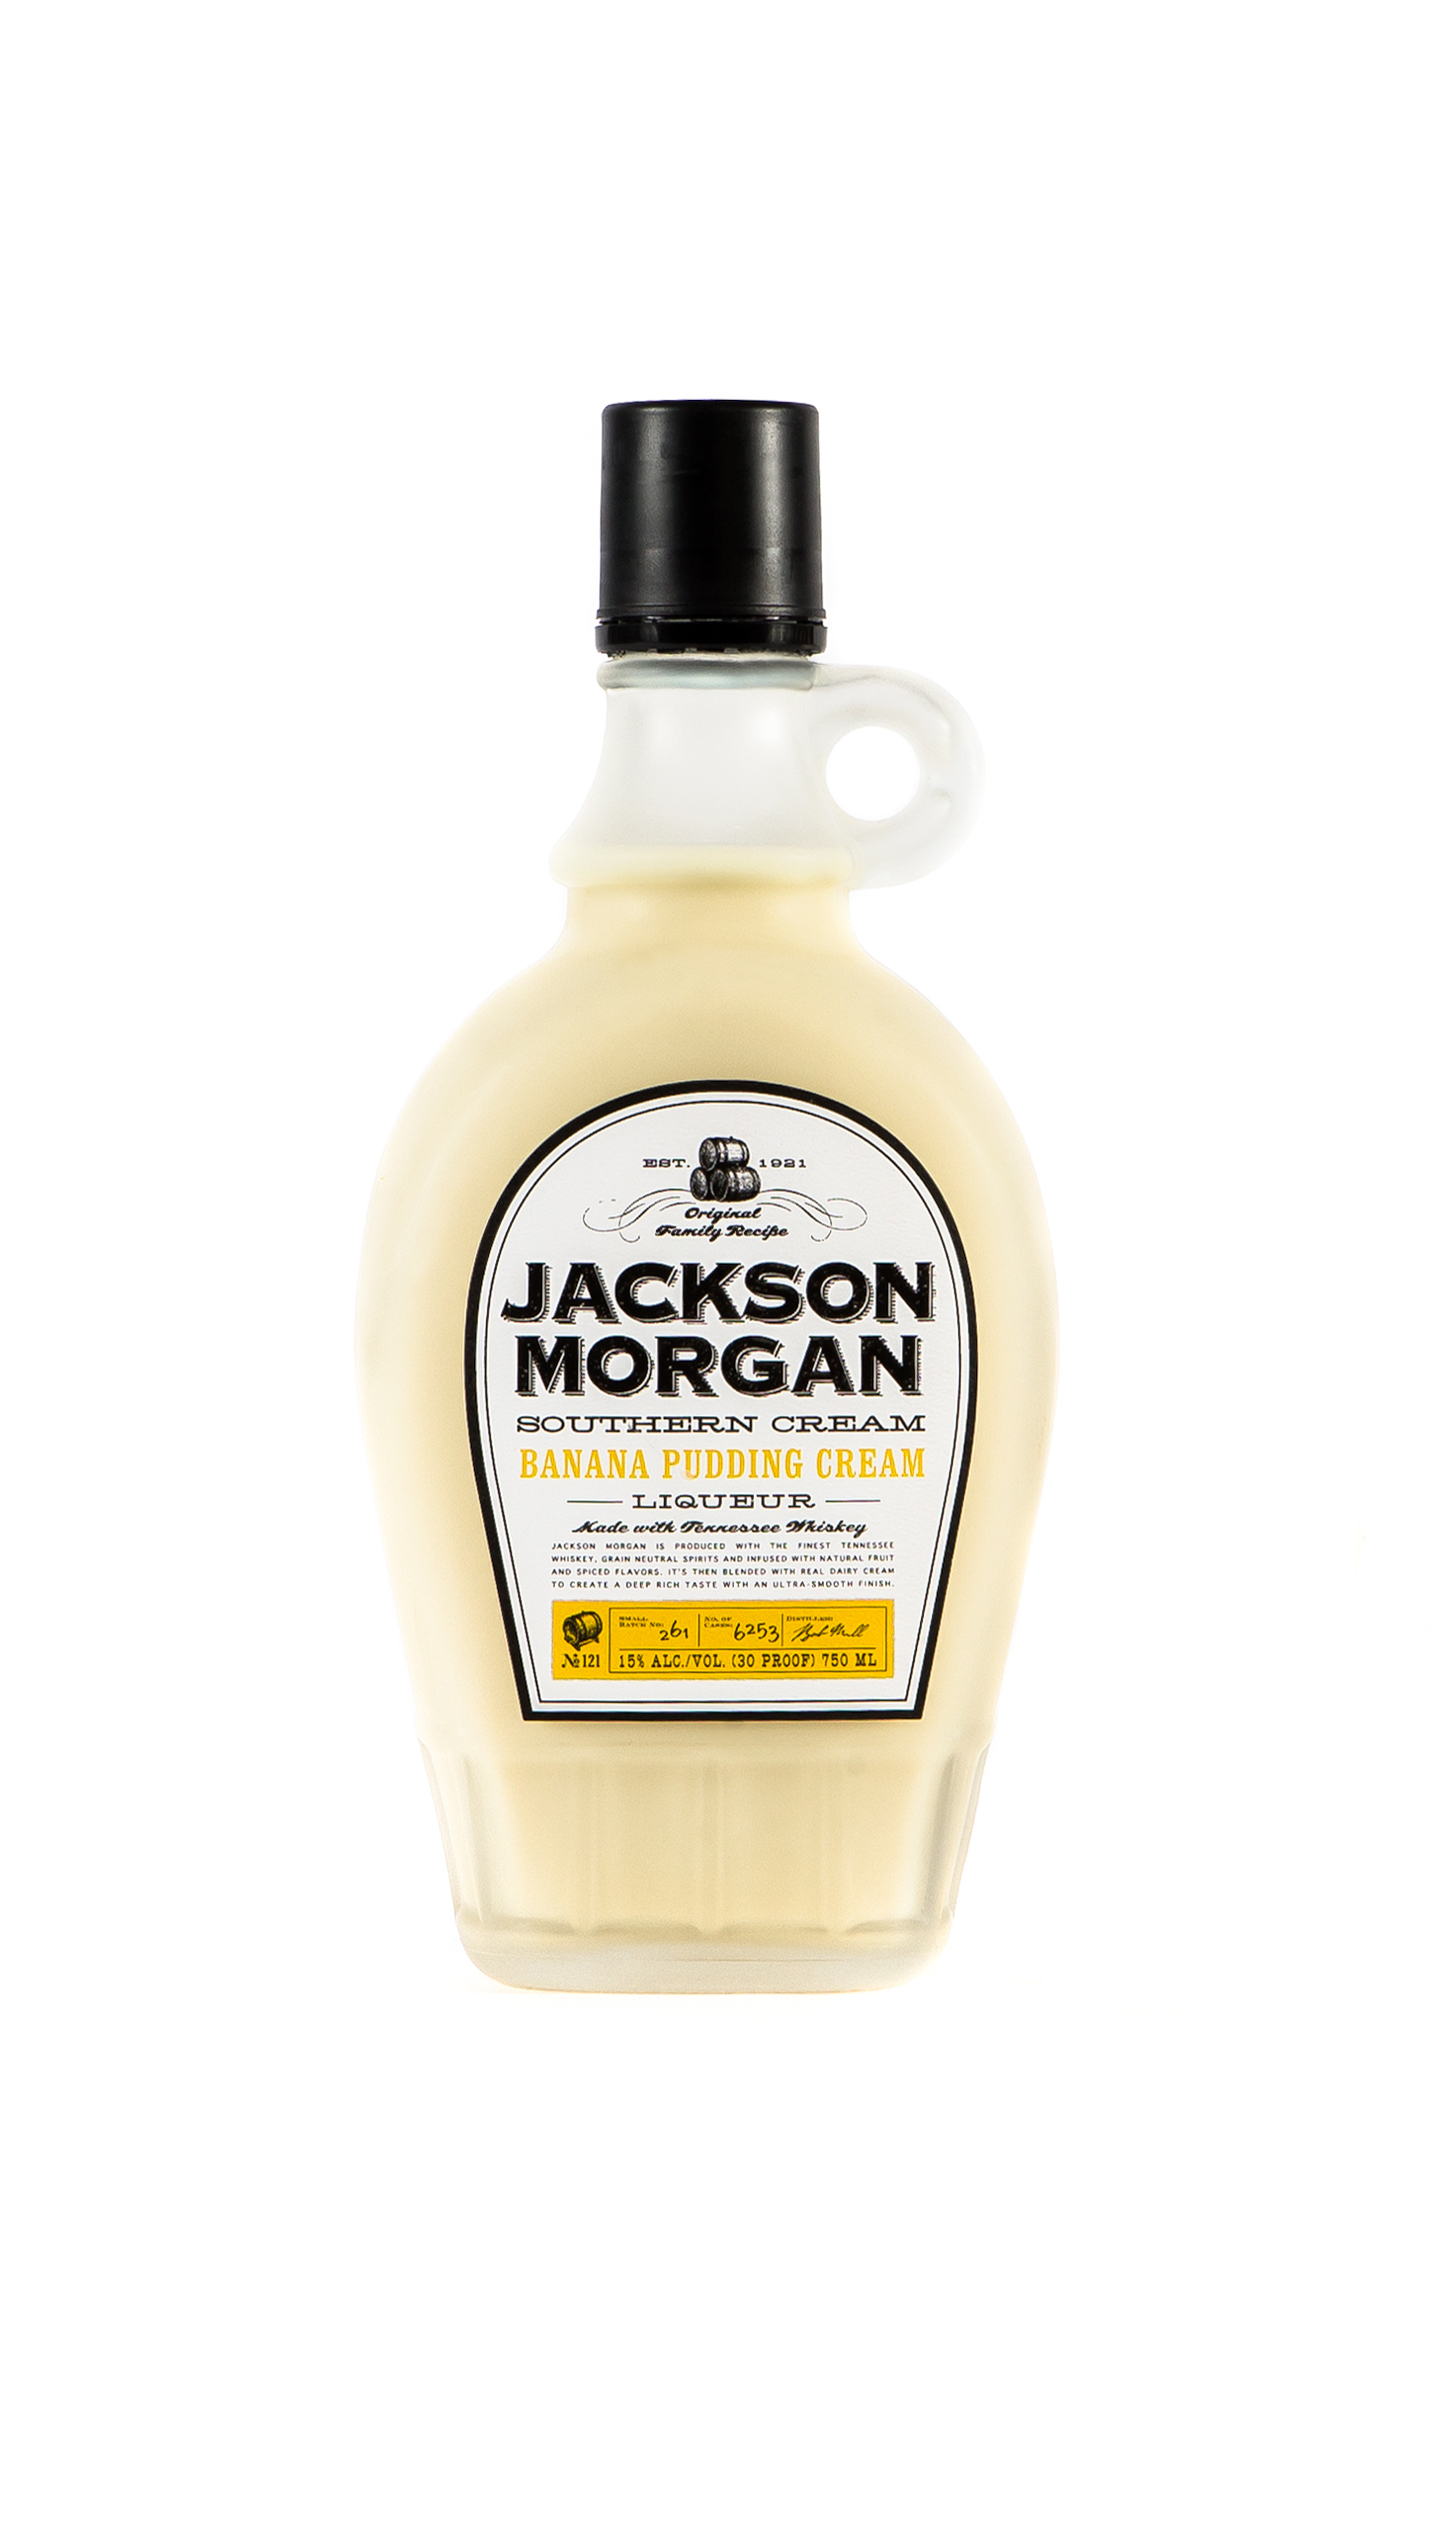 JM Banana Pudding Cream